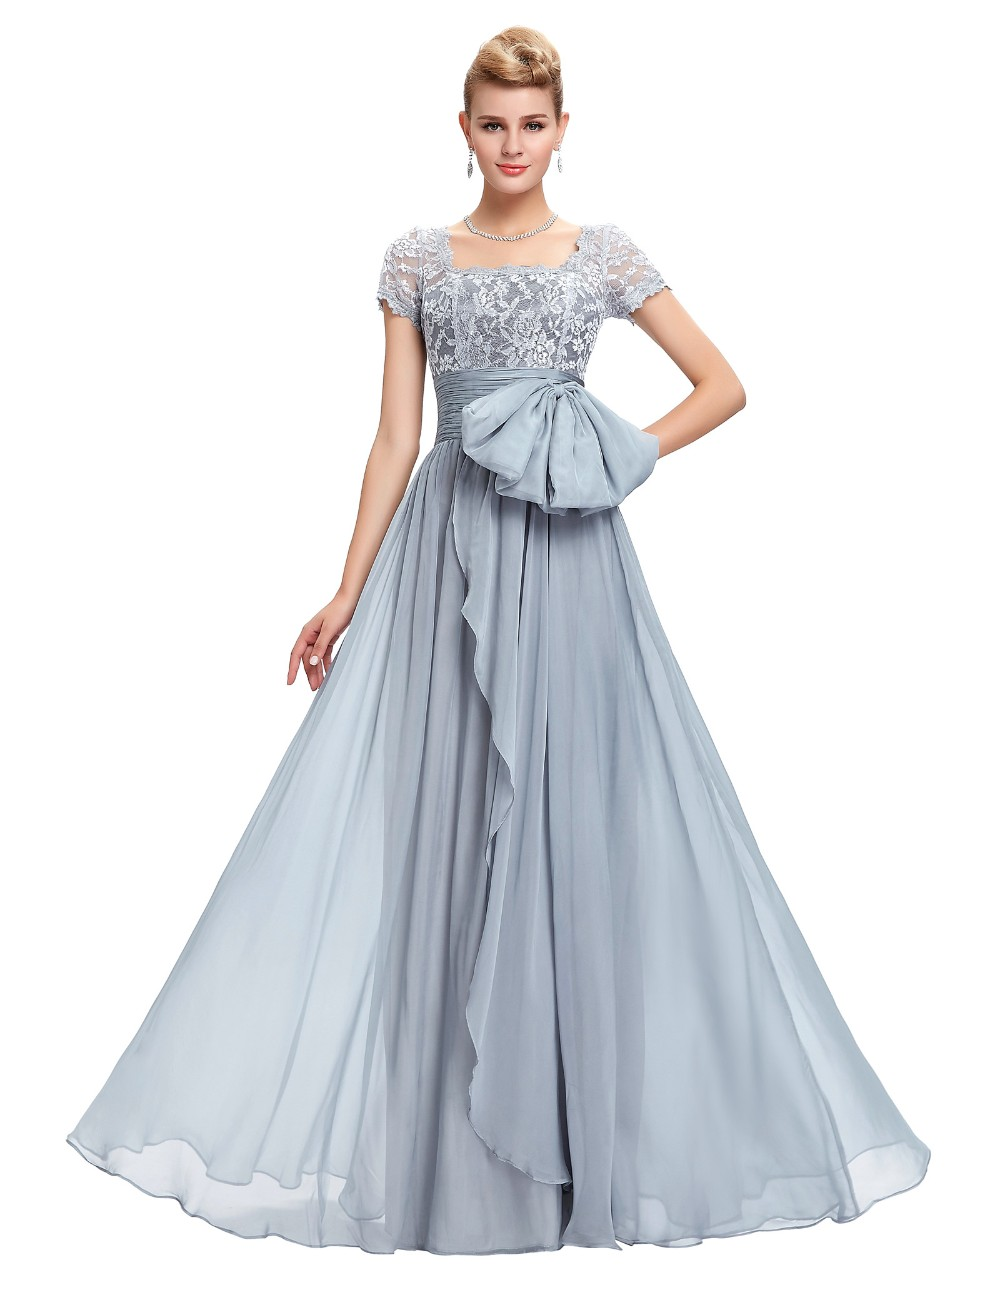 Grace Karin Chiffon Lace Elegant Long Evening Dresses Grey Formal Evening Gowns robe de soiree longue GK4445 7